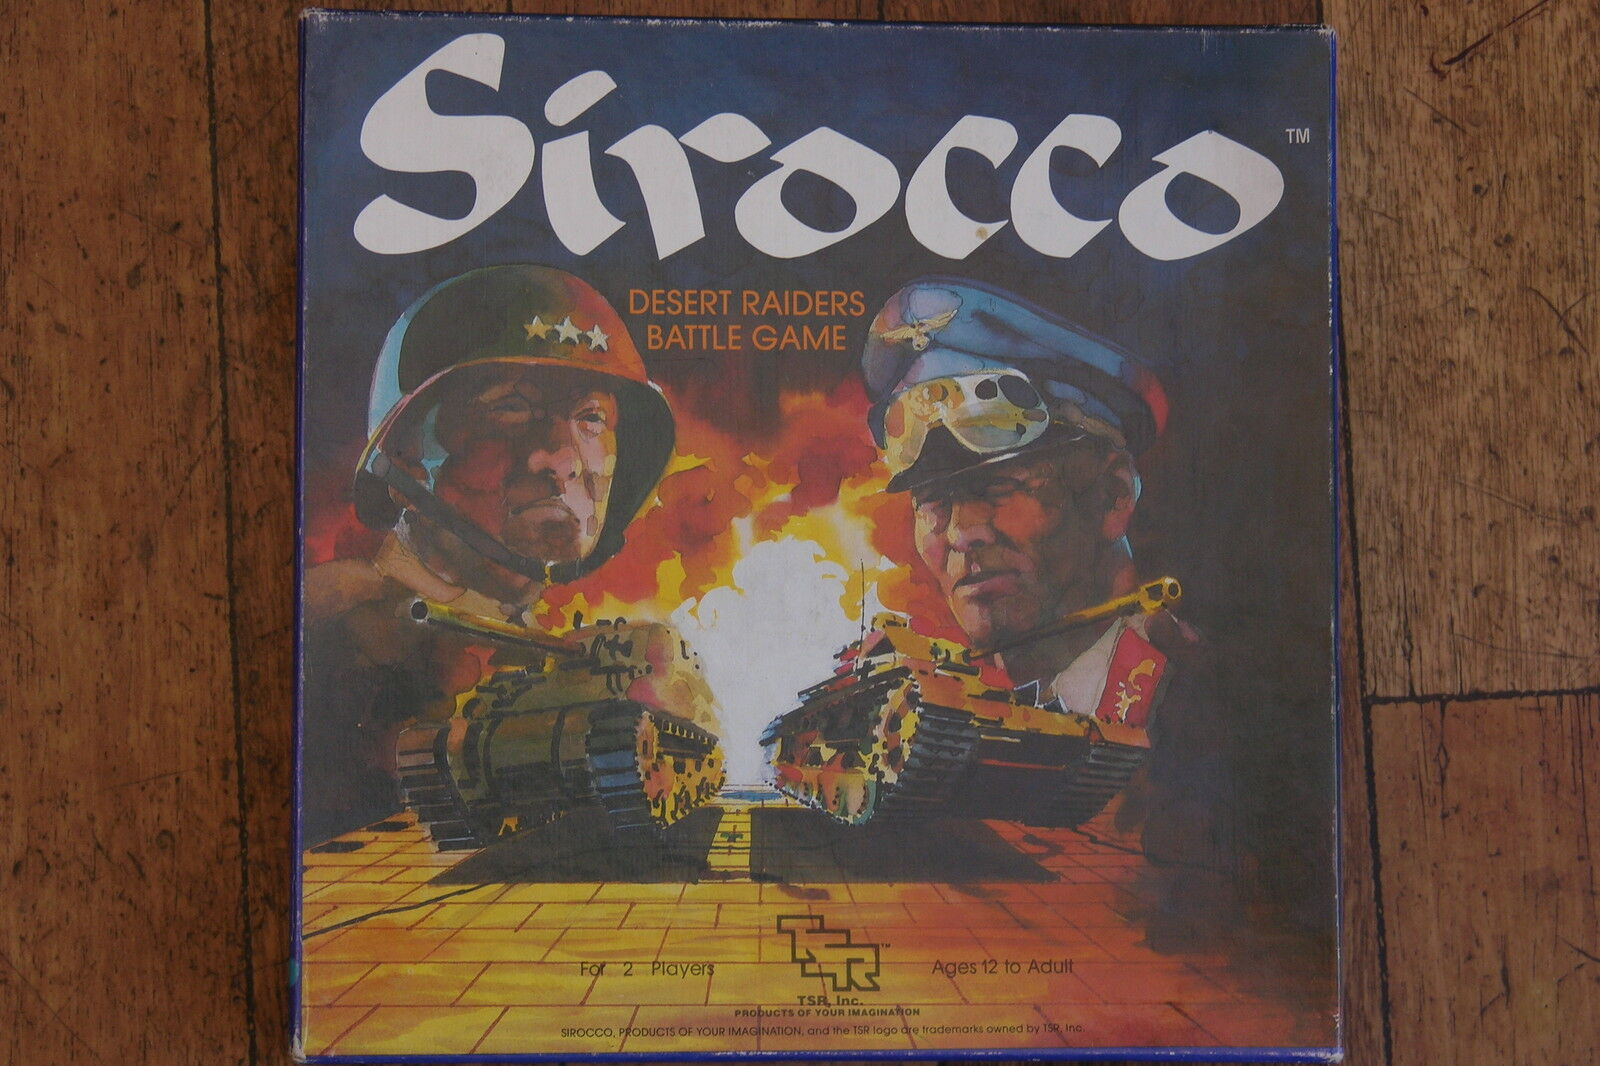 Tsr, Sirocco Desierto Raiders Battle